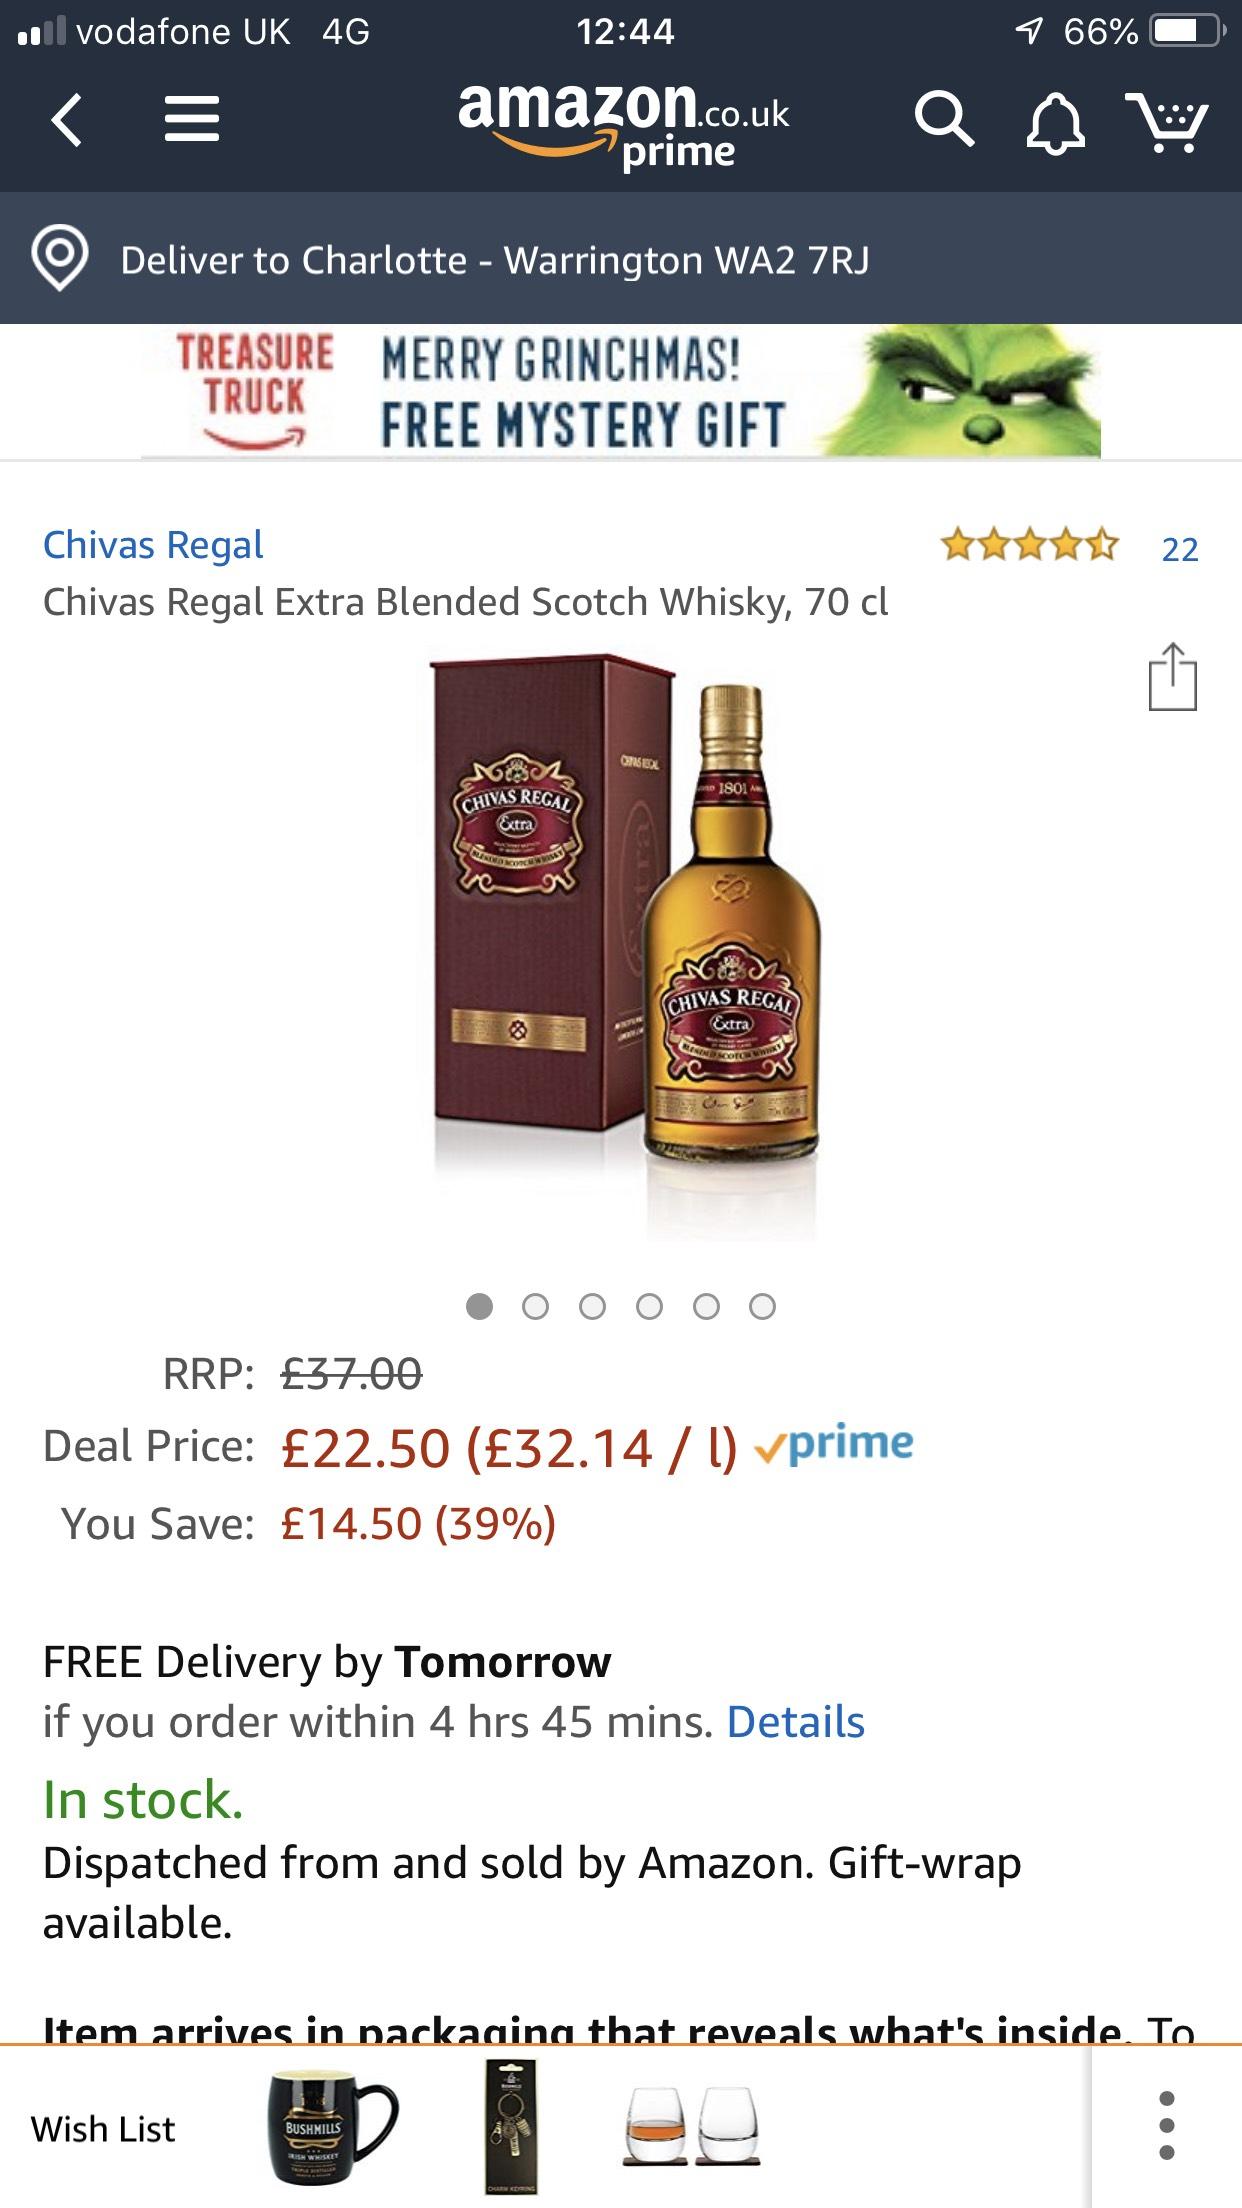 Chivas Regal Extra Blended Scotch Whisky, 70 cl  £22.50 @ Amazon